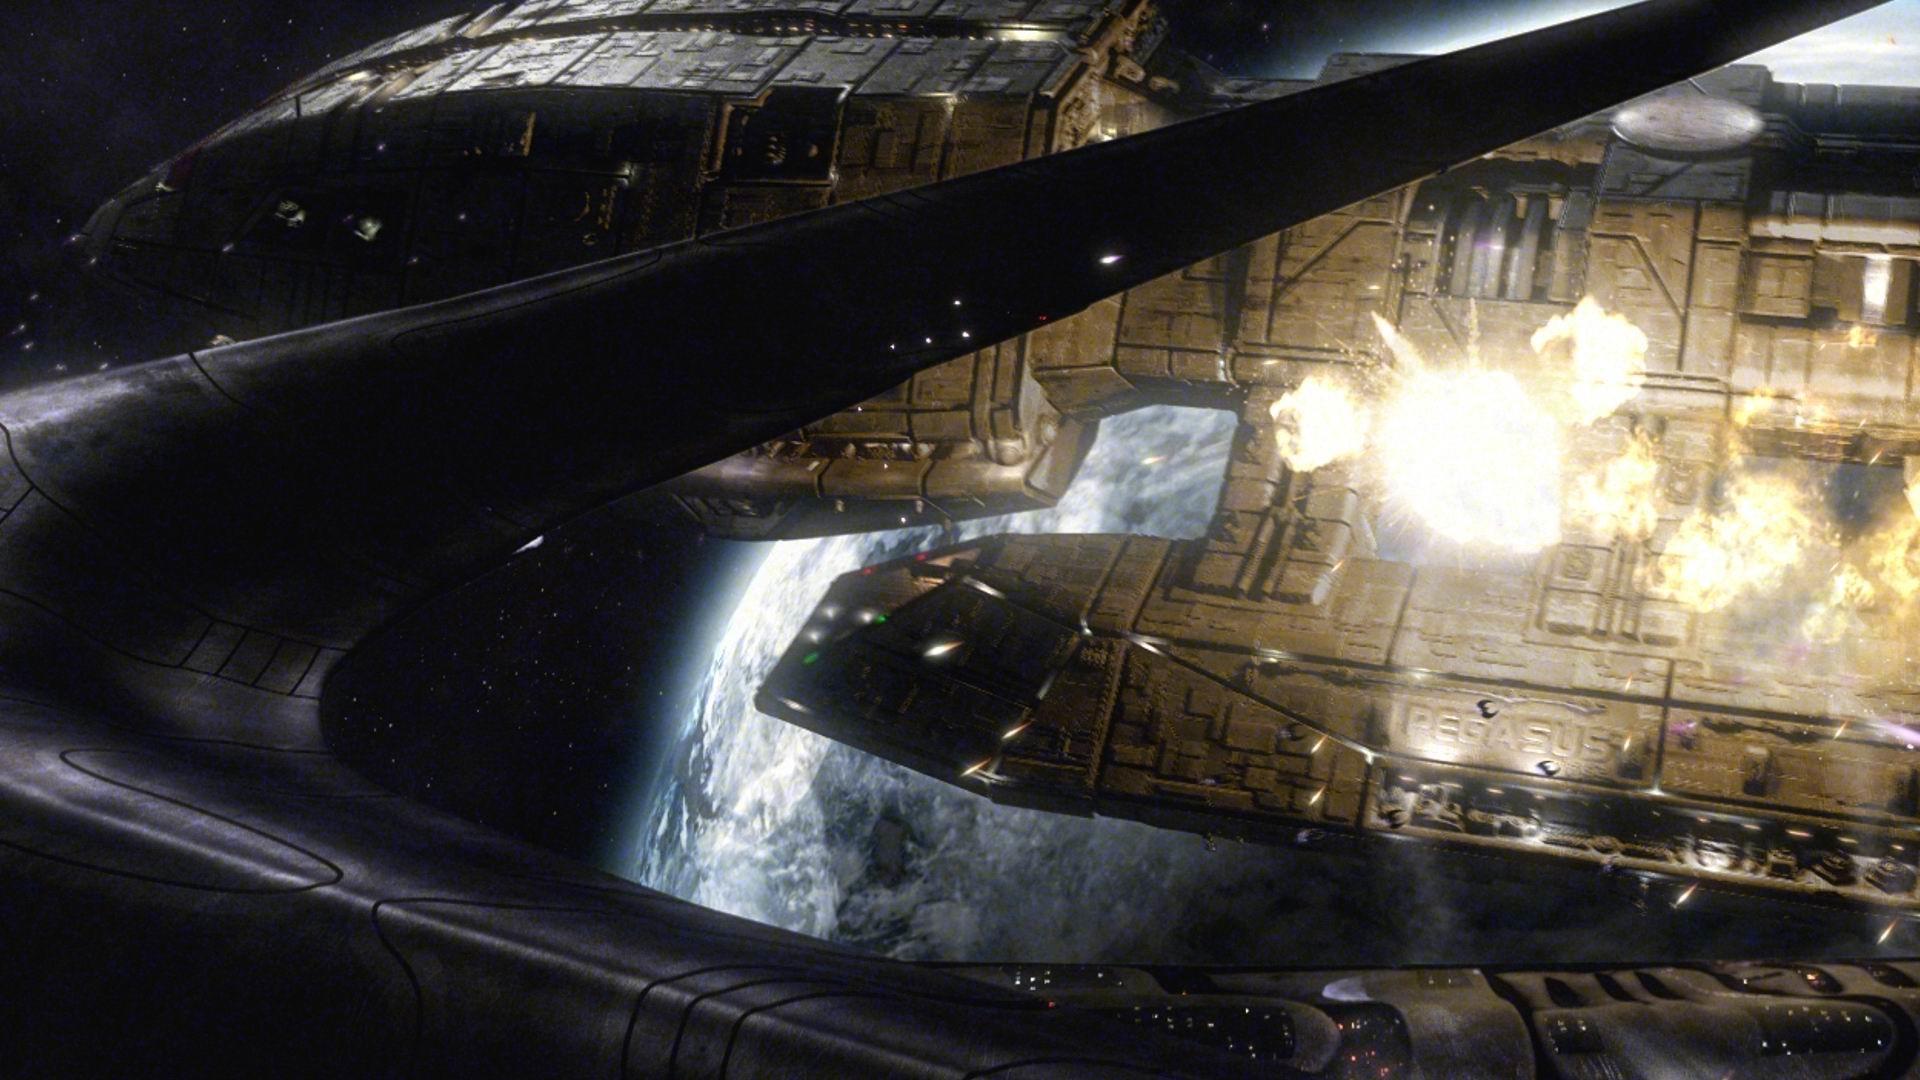 2560x1440 Battlestar Galactica Viper Wallpaper 471048